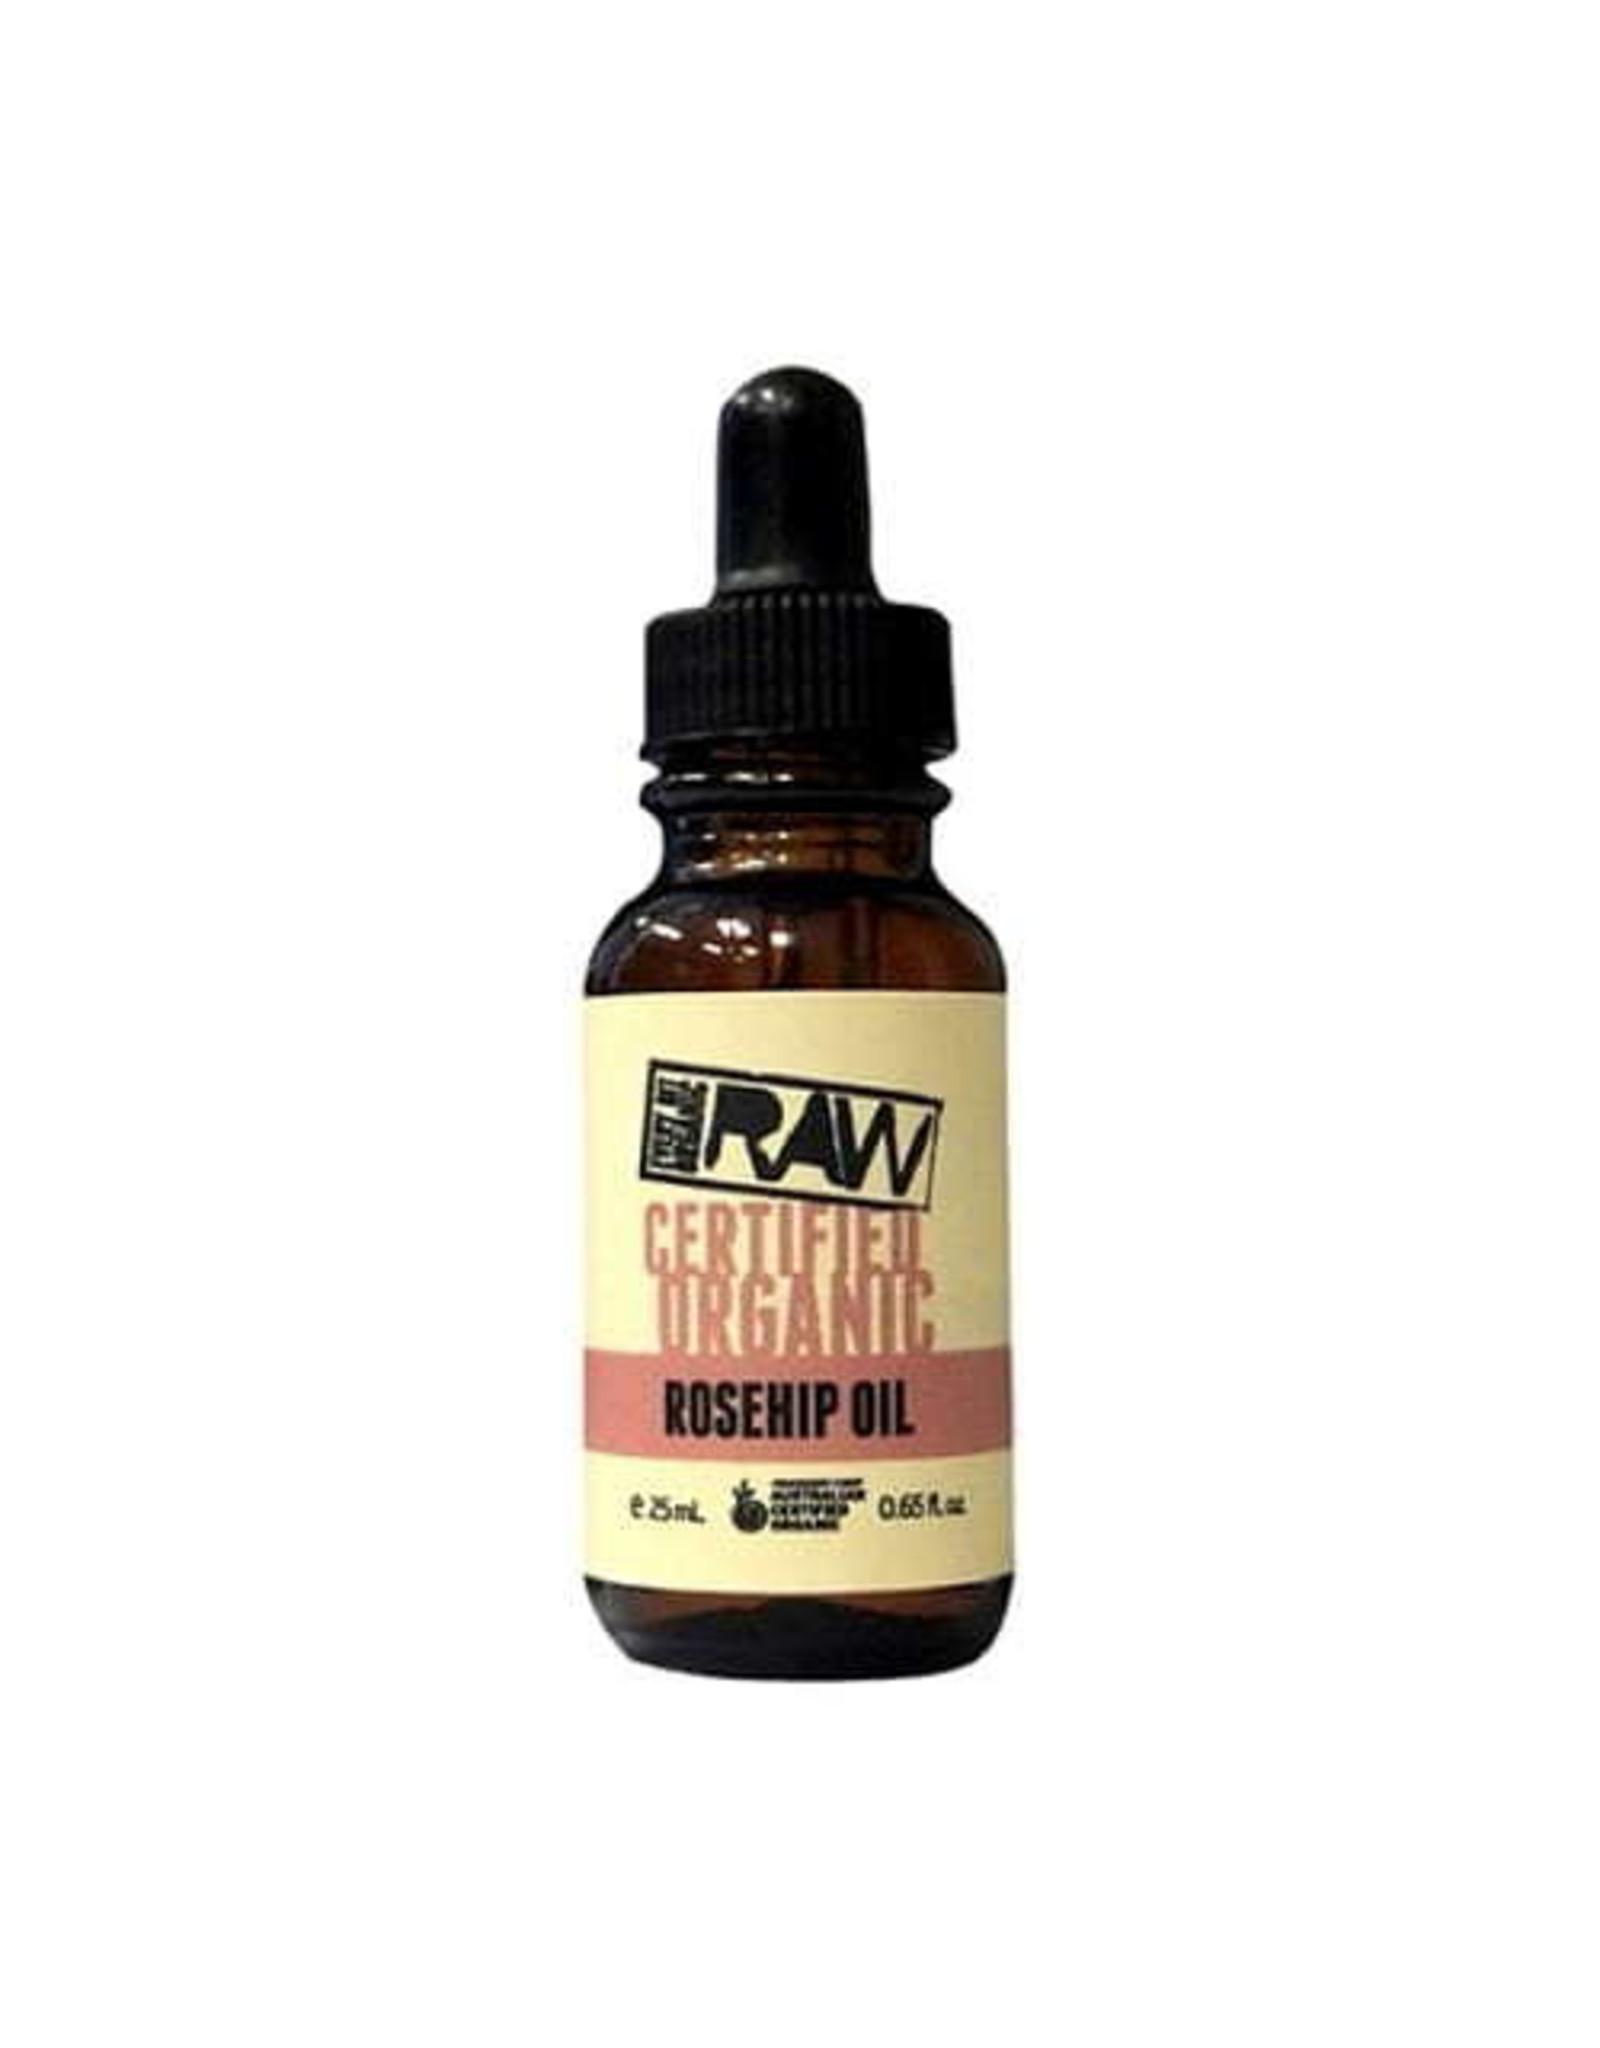 Every Bit Organic Raw Certified Organic Rosehip Oil 50ml